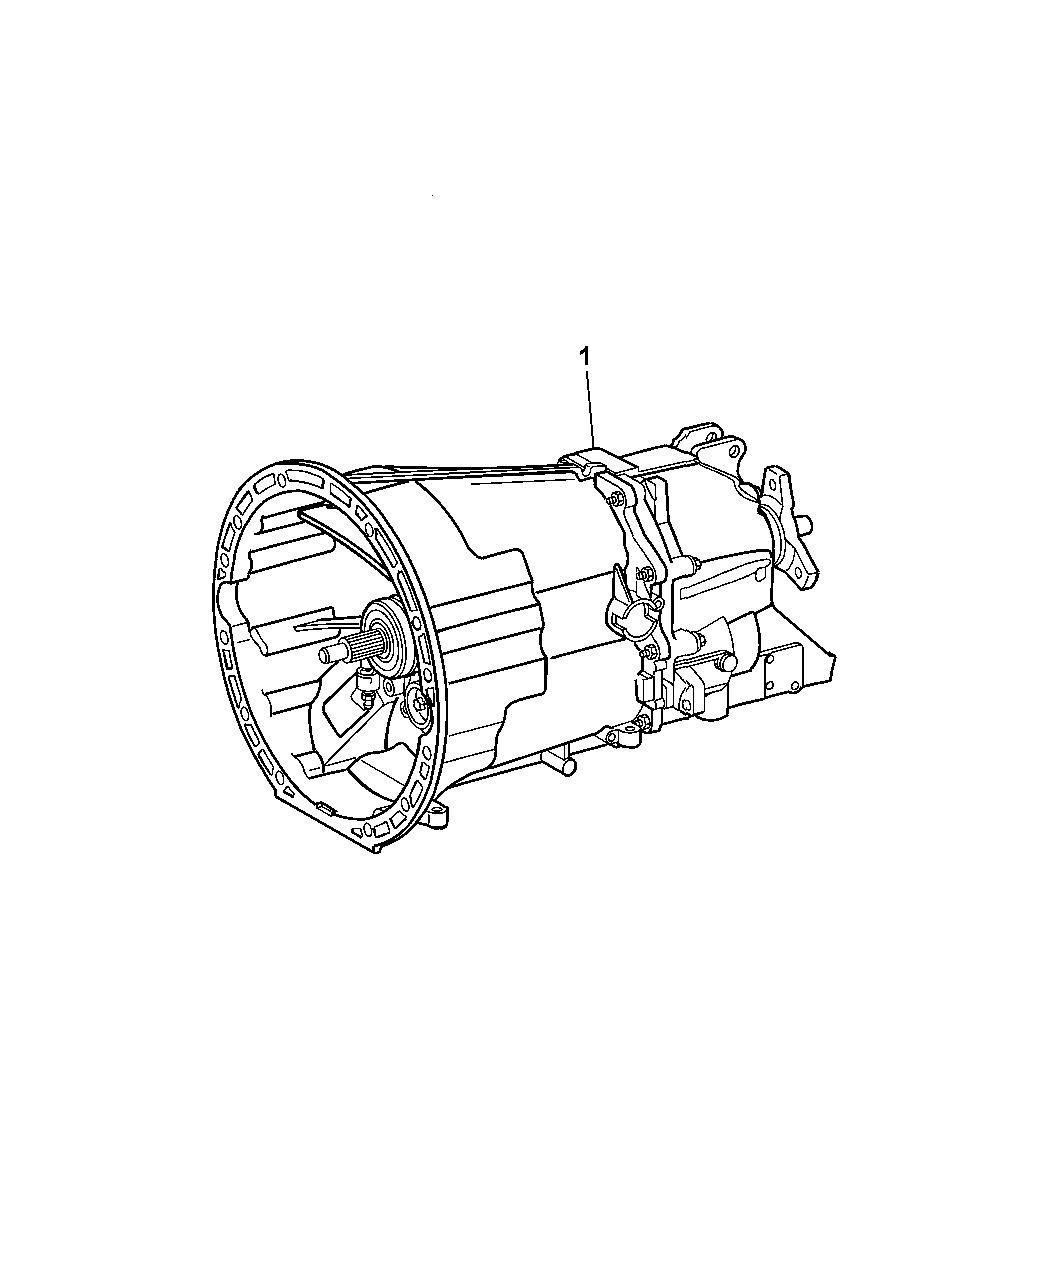 2007 Dodge Nitro Transmission Assembly Of Manual Transmission